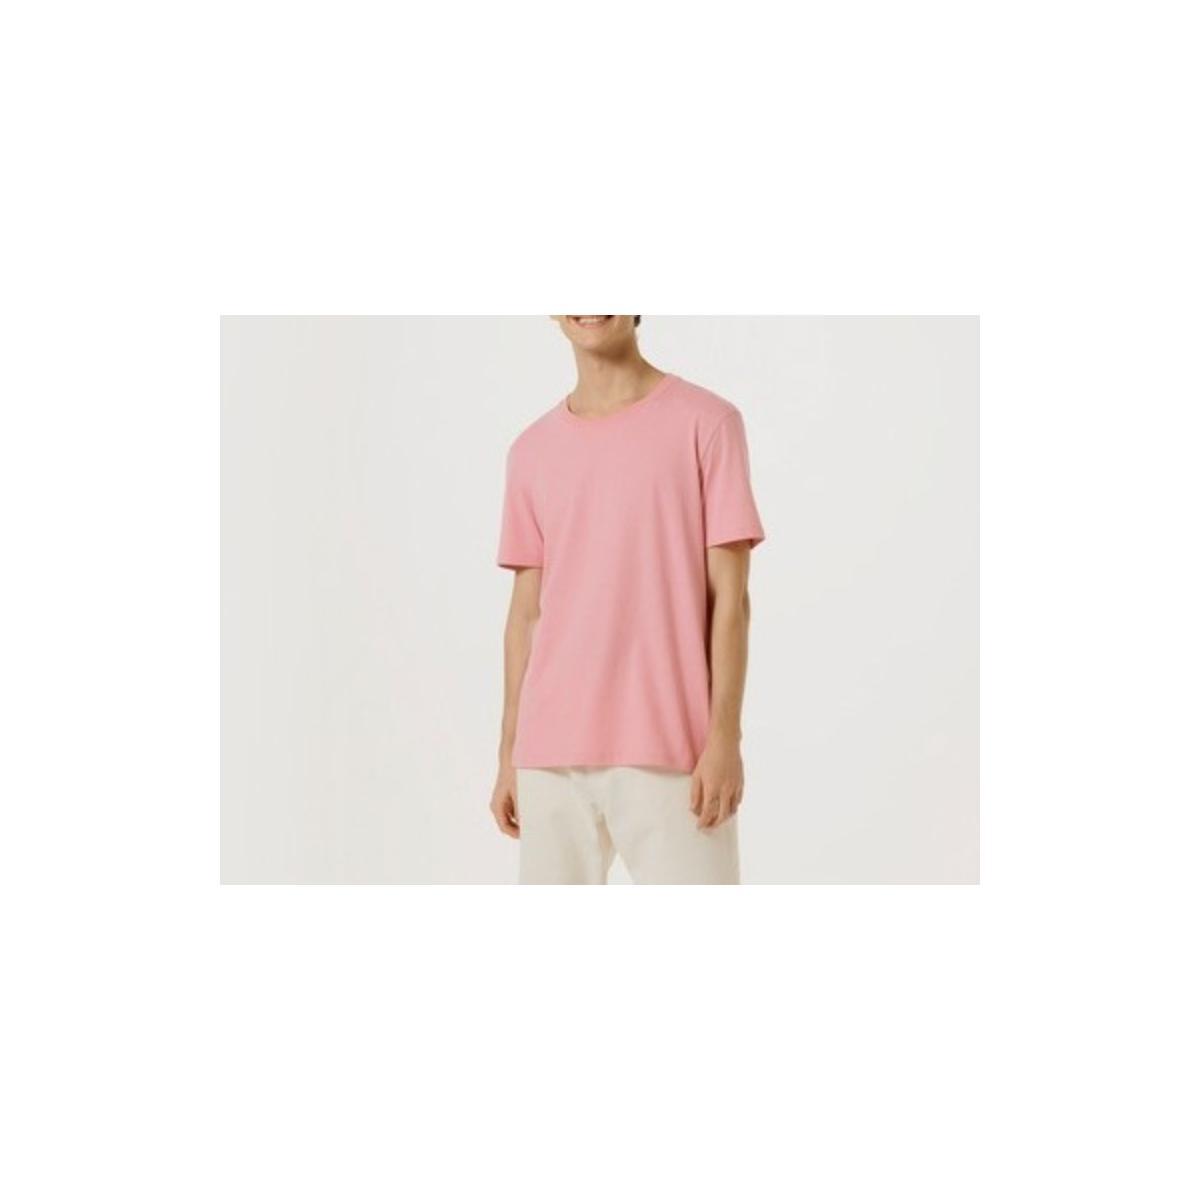 Camiseta Masculina Hering 0201 Kapen Rosa